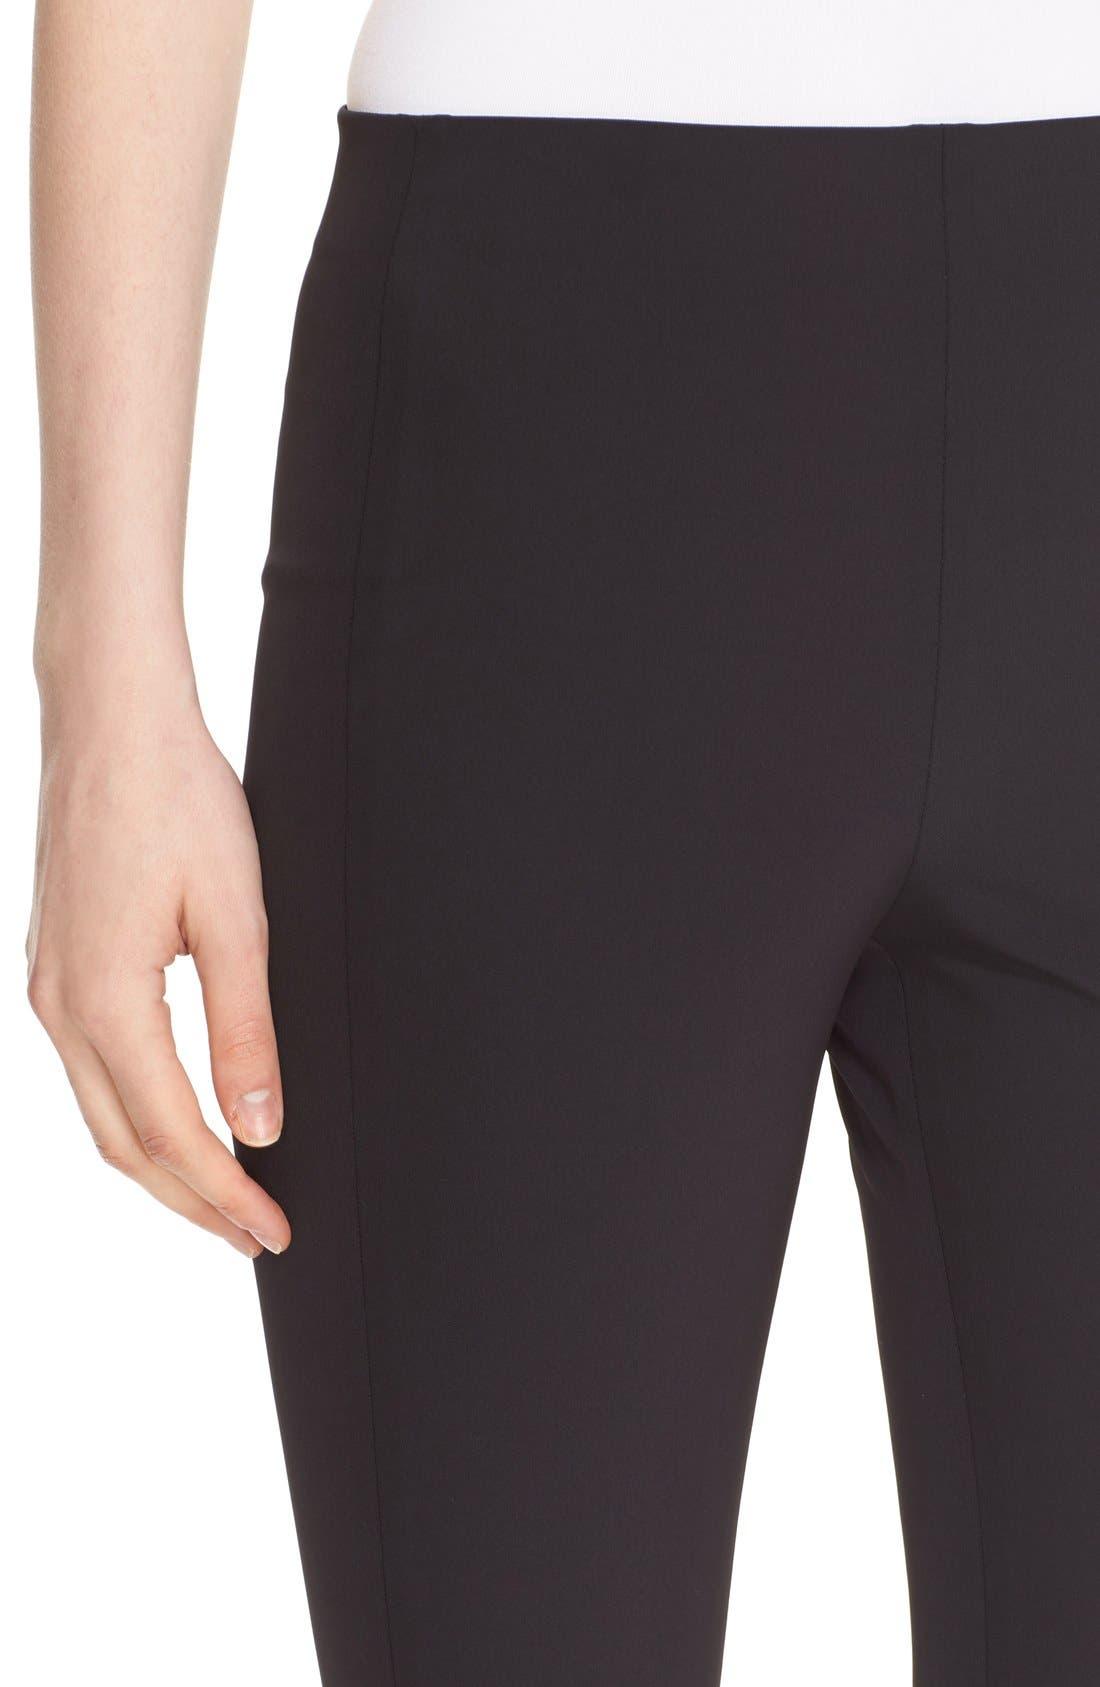 'Navalane Becker' Stretch Ponte Skinny Pants,                             Alternate thumbnail 4, color,                             001